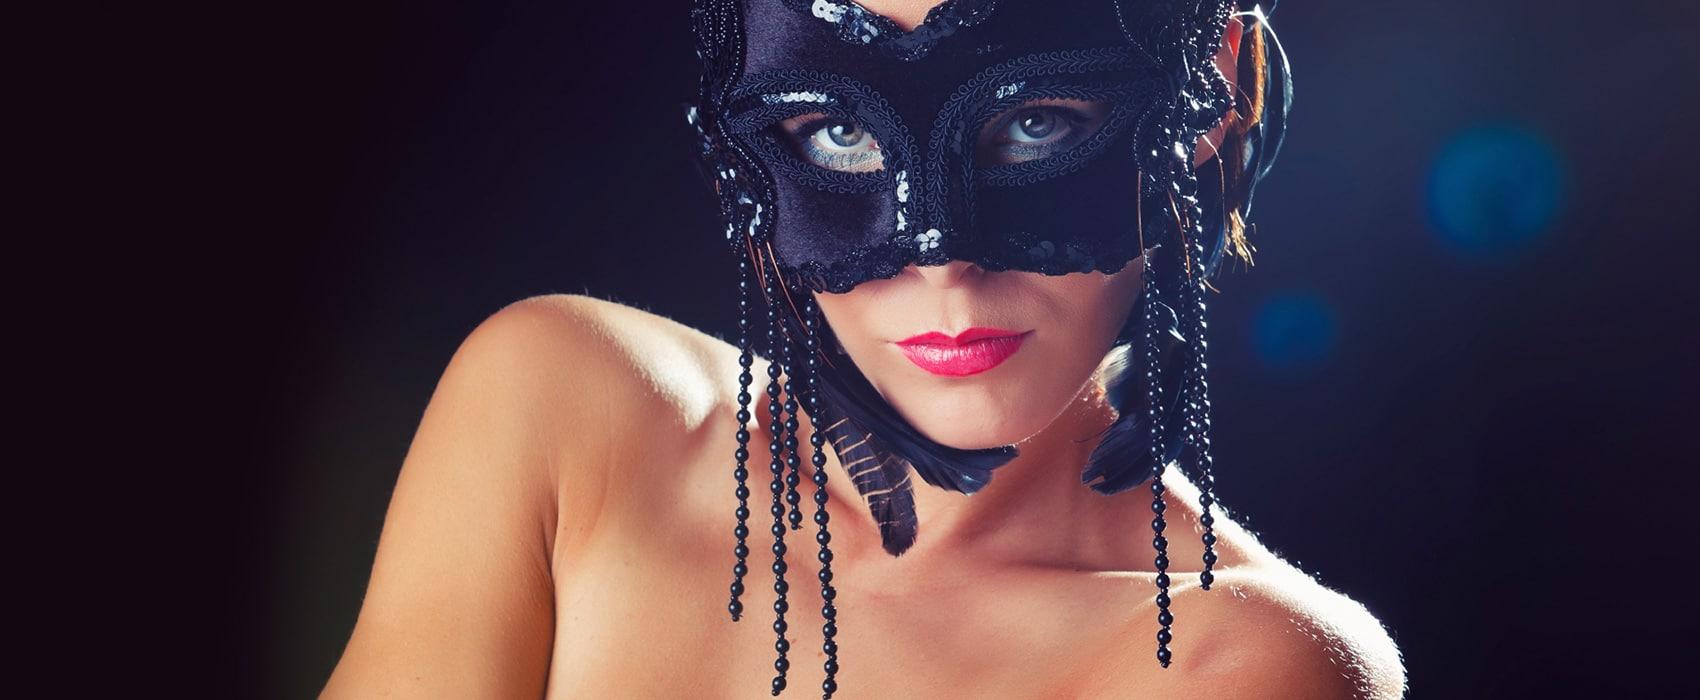 Desire | Beyond Seduction Contact Us